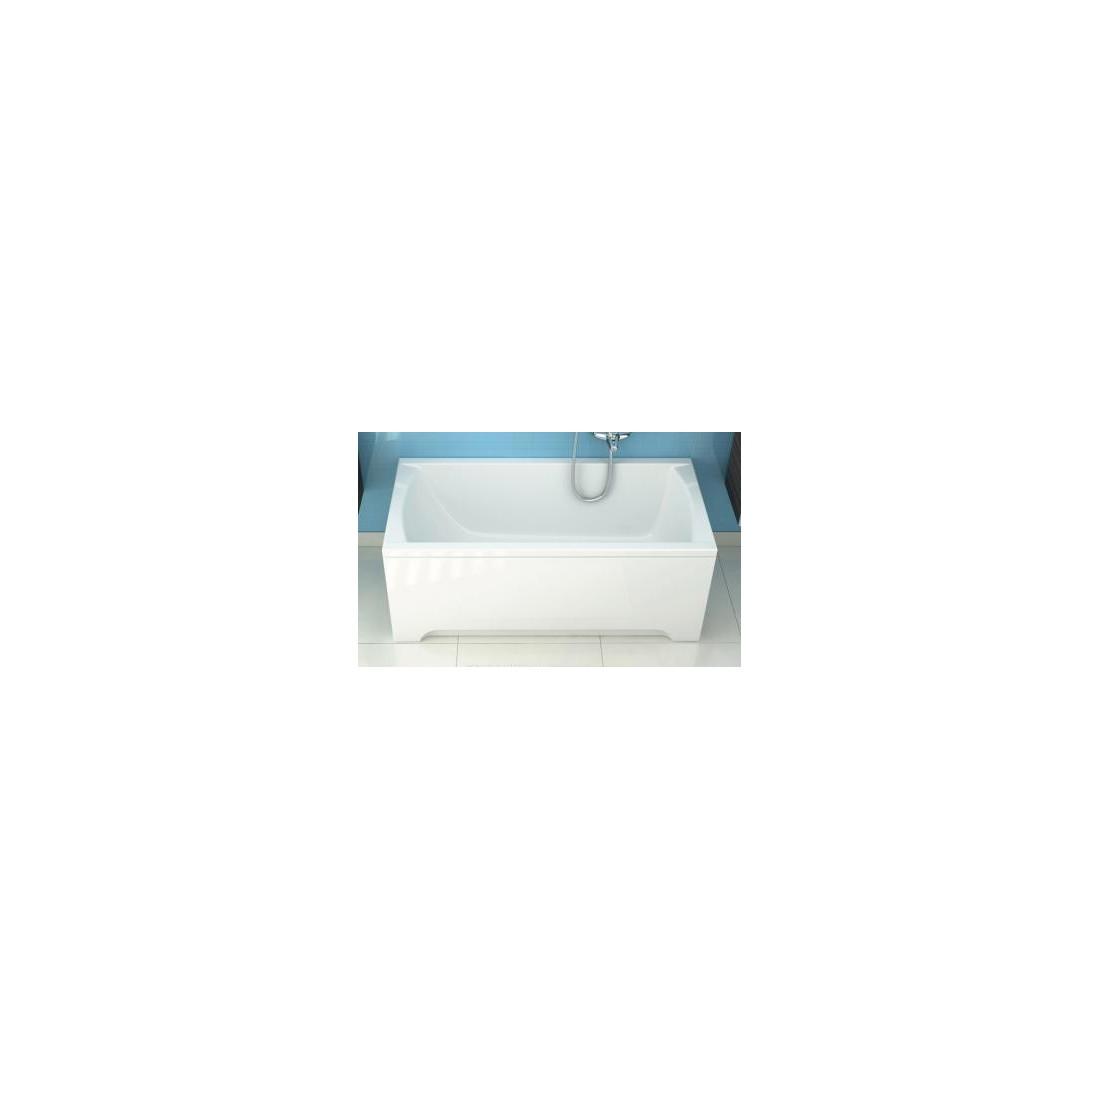 Akrilinė vonia RAVAK Classic N, 170x70